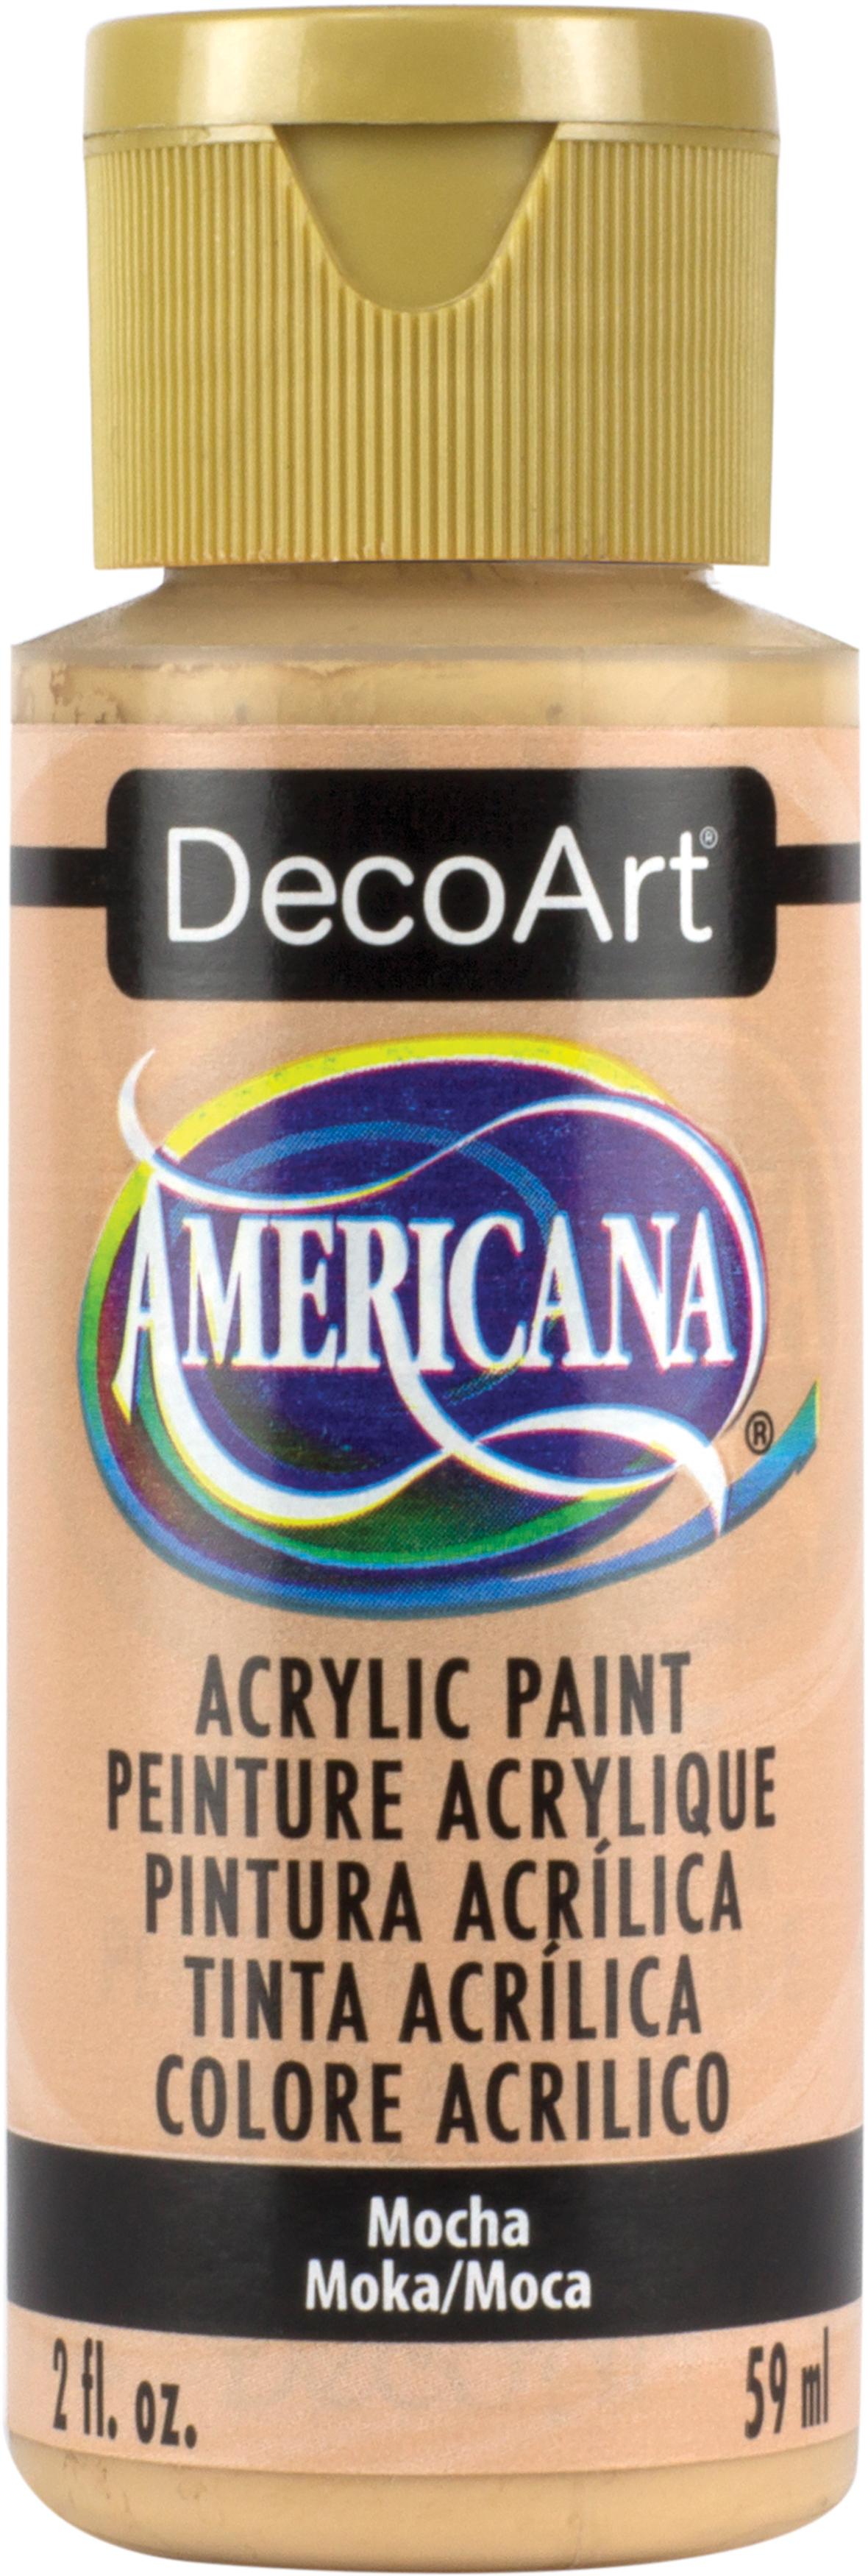 Americana Acrylic Paint 2oz-Mocha